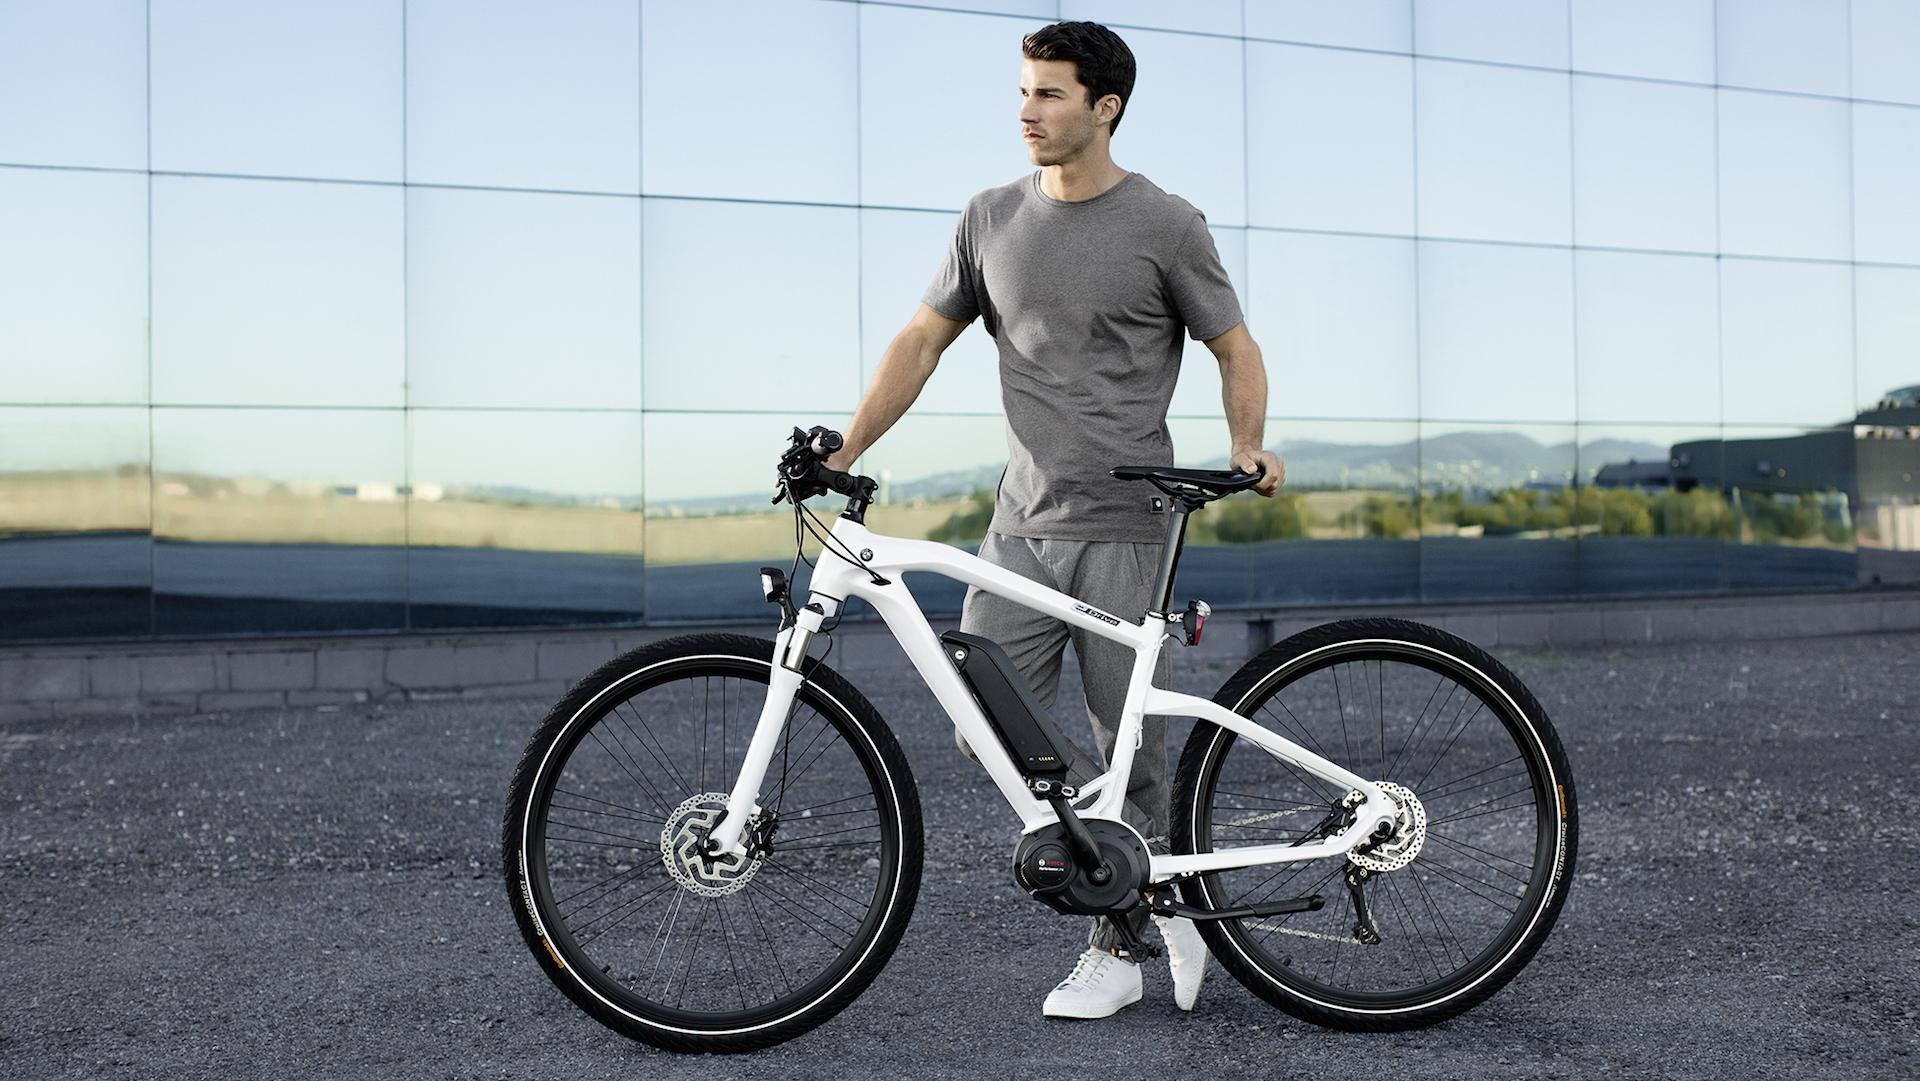 bicicletas-bmw-19092016-in3